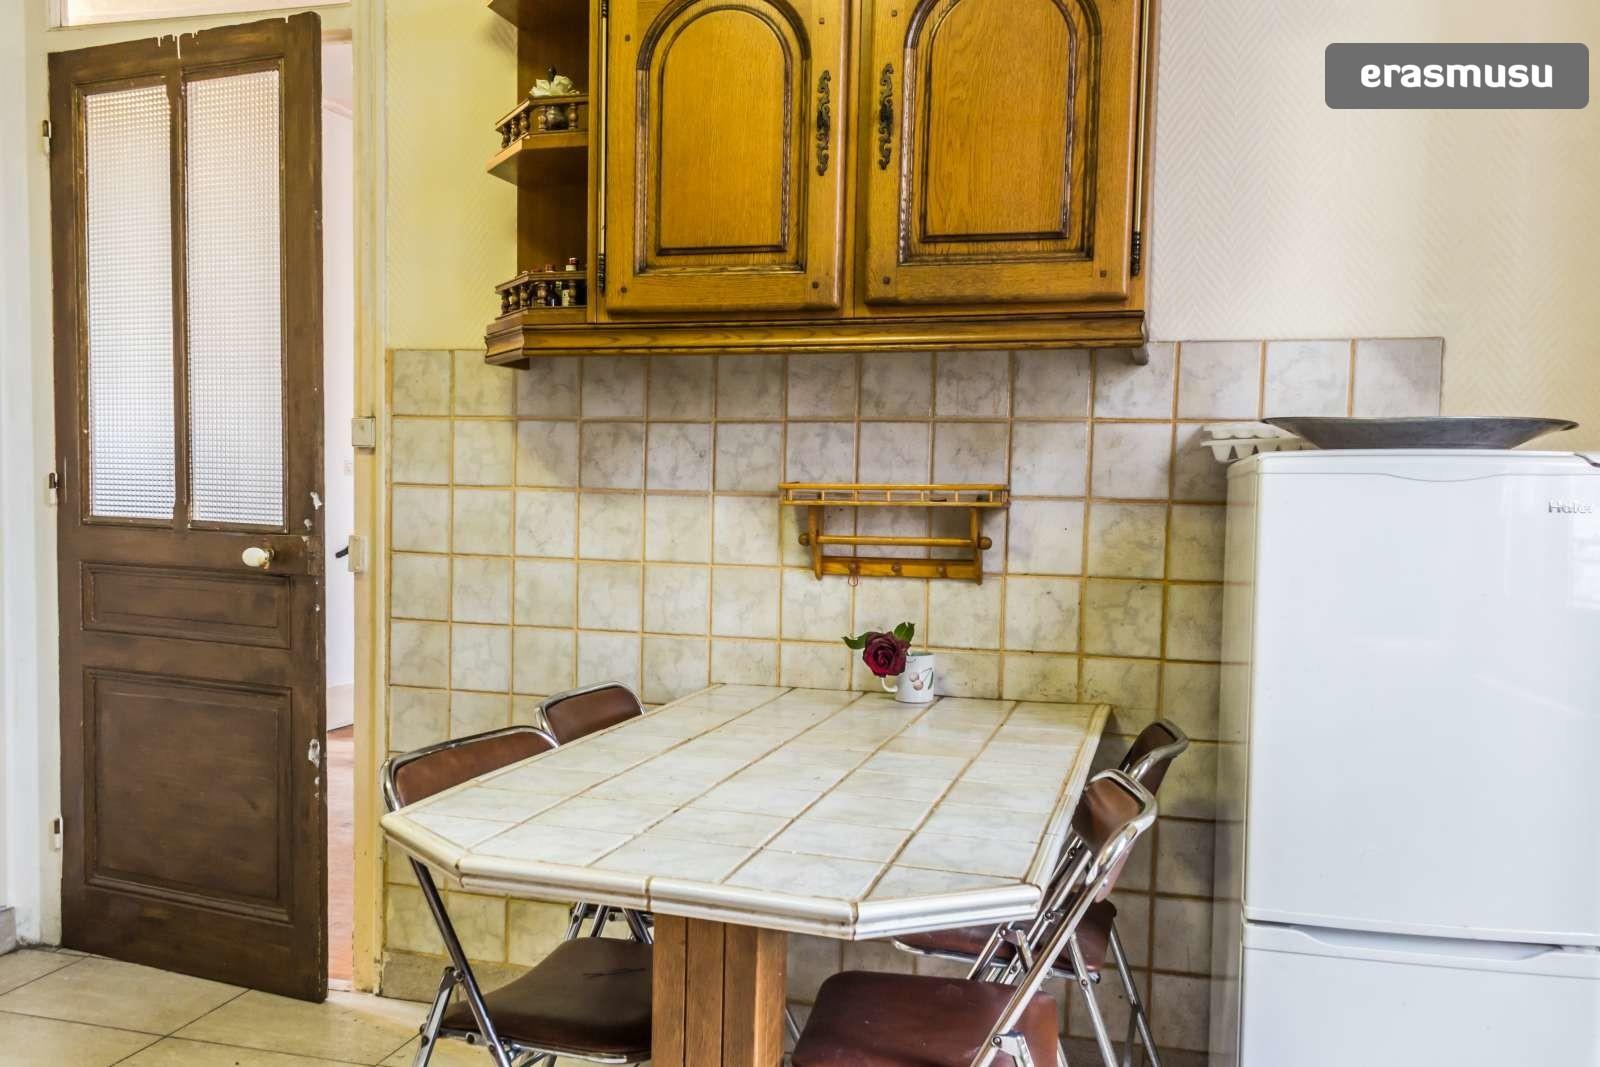 large-1-bedroom-apartment-dryer-rent-villeurbanne-area-18a759eeb